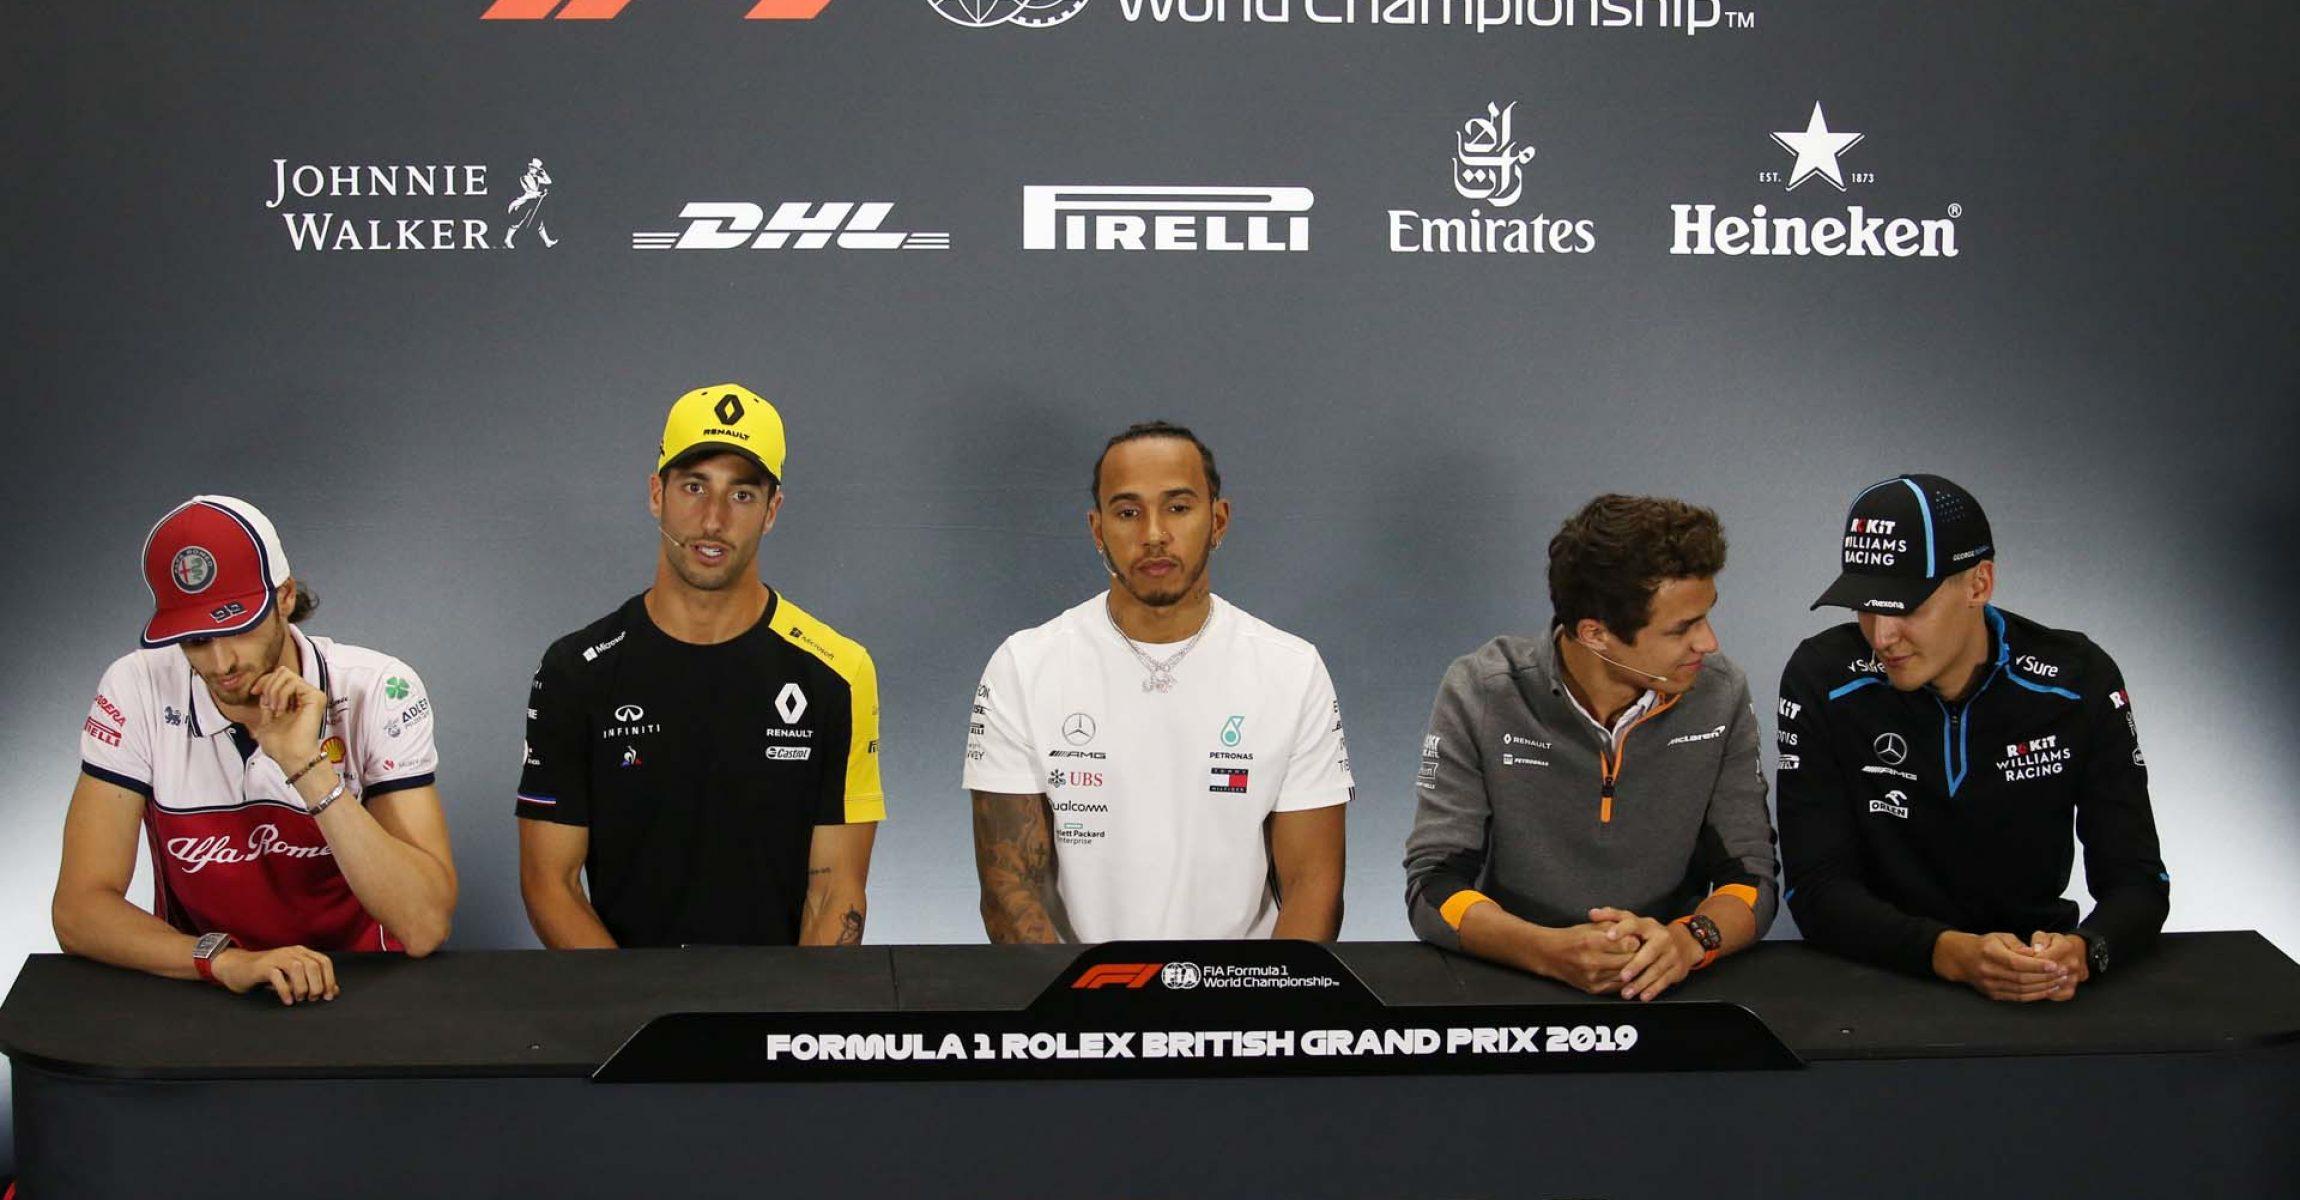 The FIA Press Conference (L to R): Antonio Giovinazzi (ITA) Alfa Romeo Racing; Daniel Ricciardo (AUS) Renault F1 Team; Lewis Hamilton (GBR) Mercedes AMG F1; Lando Norris (GBR) McLaren; George Russell (GBR) Williams Racing. British Grand Prix, Thursday 11th July 2019. Silverstone, England.